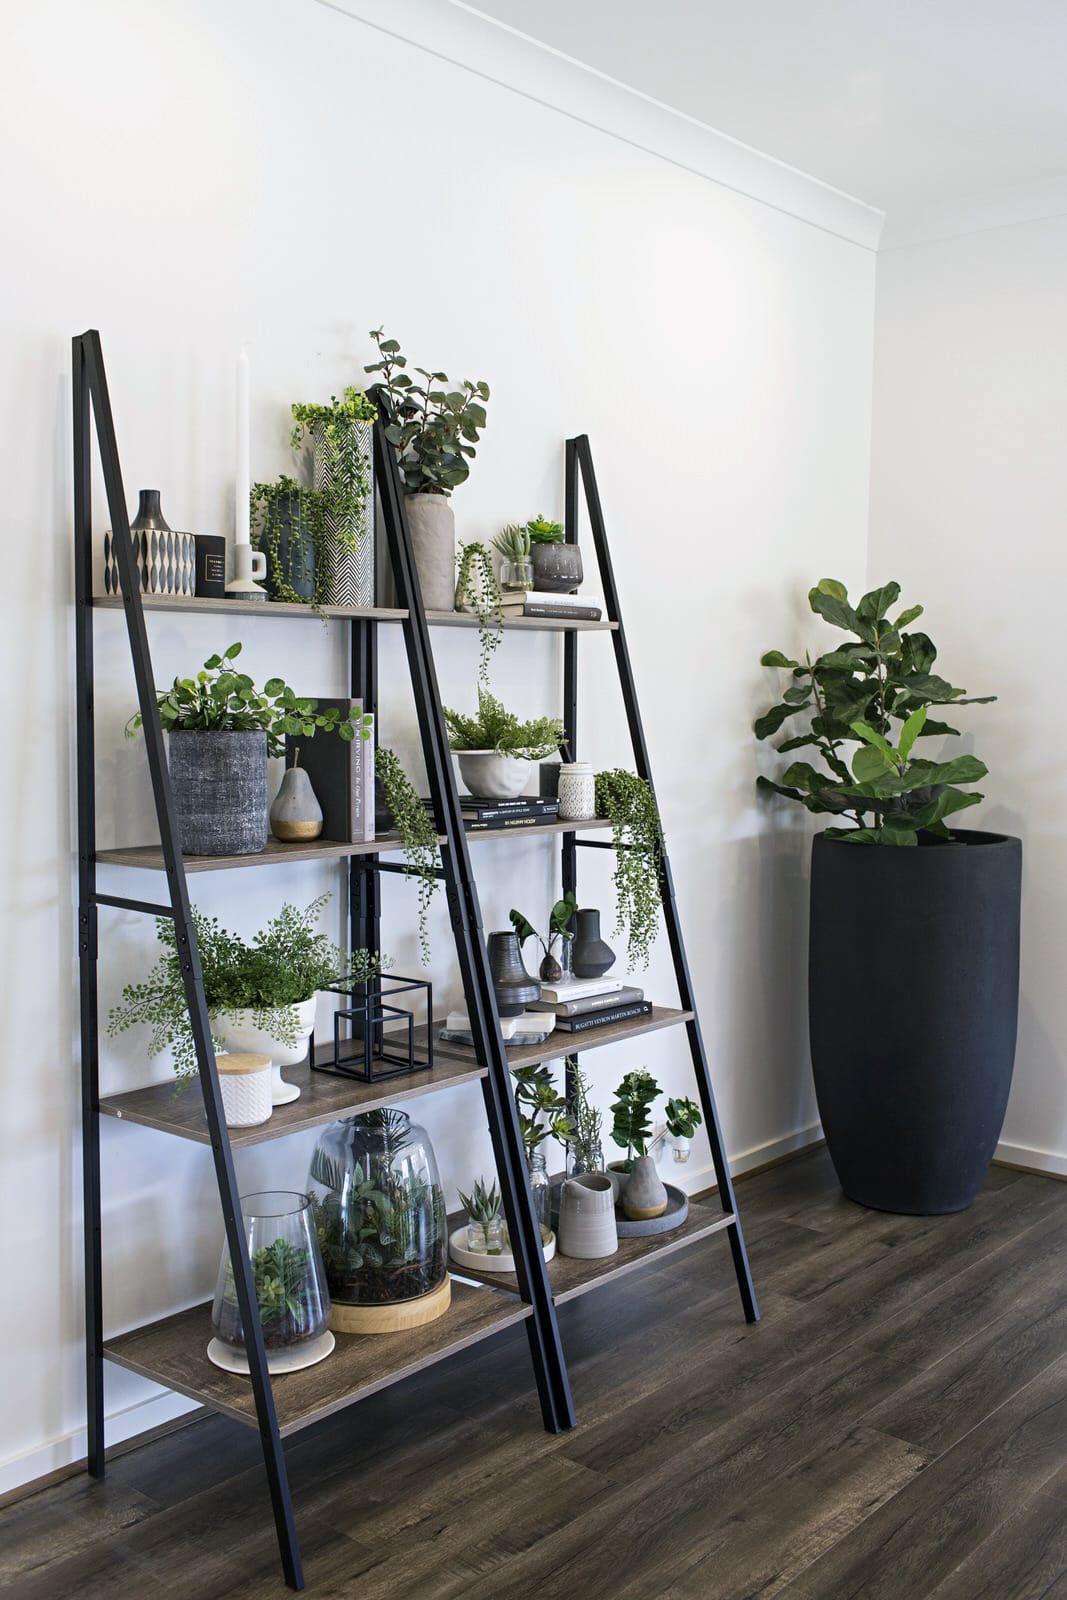 Kmart Hack Industrial Shelf Turned Vertical Garden Home